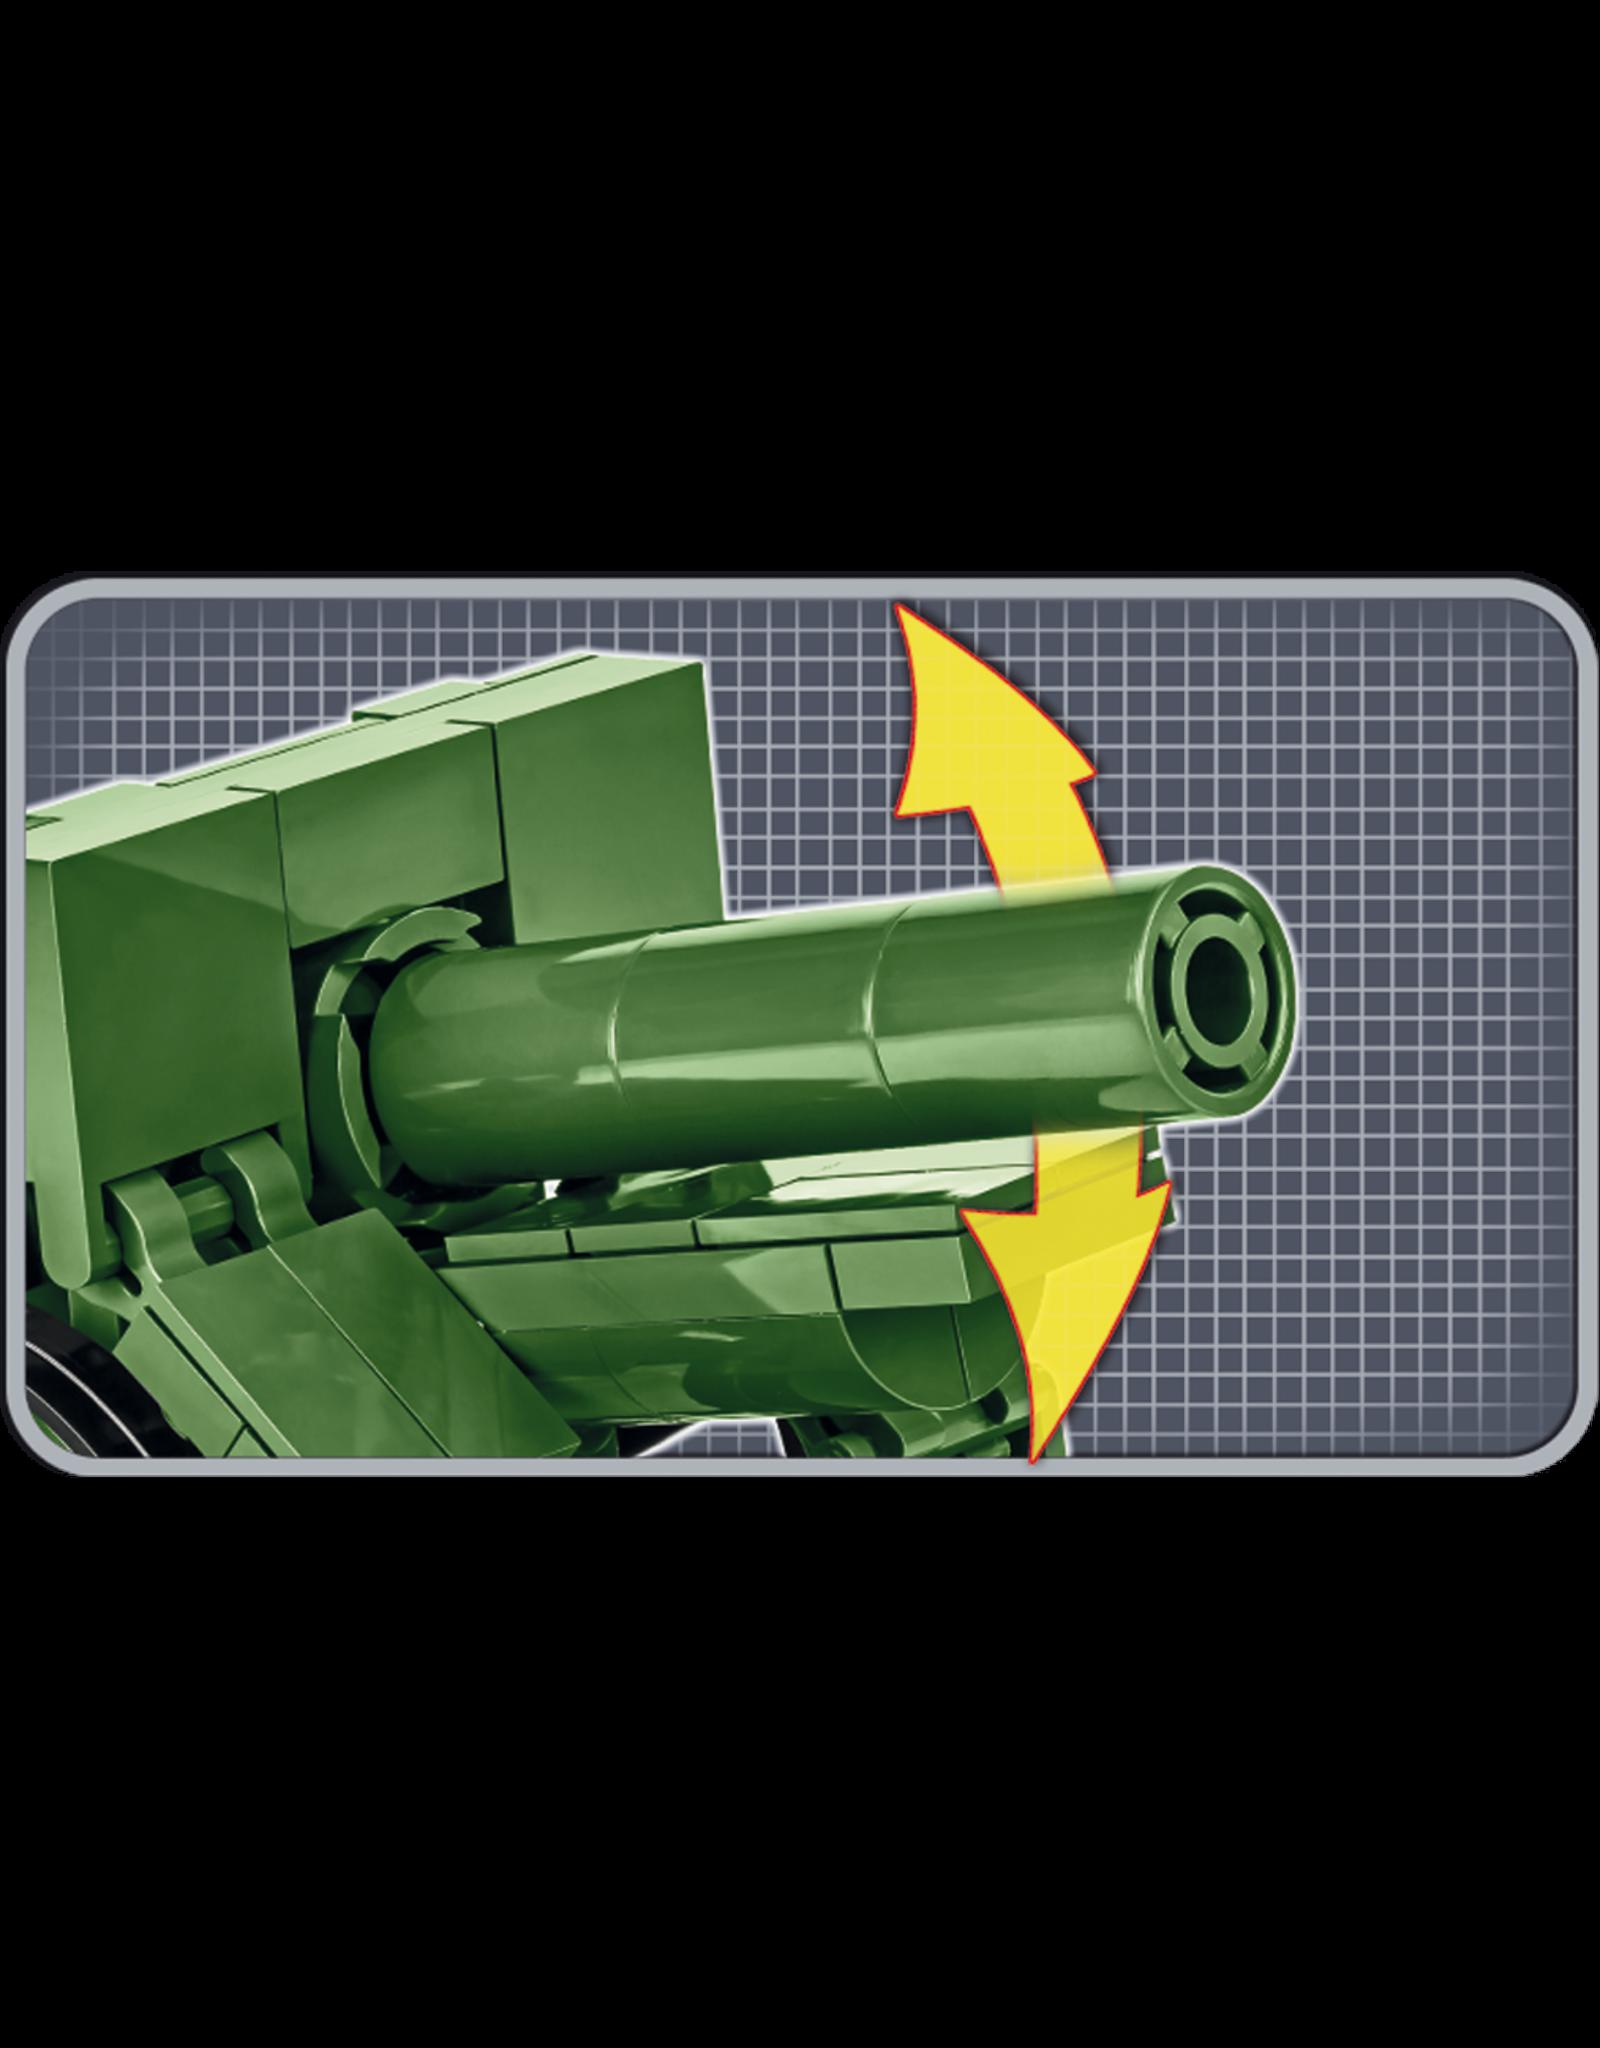 COBI COBI WW1 2981 - Heavy Howitzer 155mm